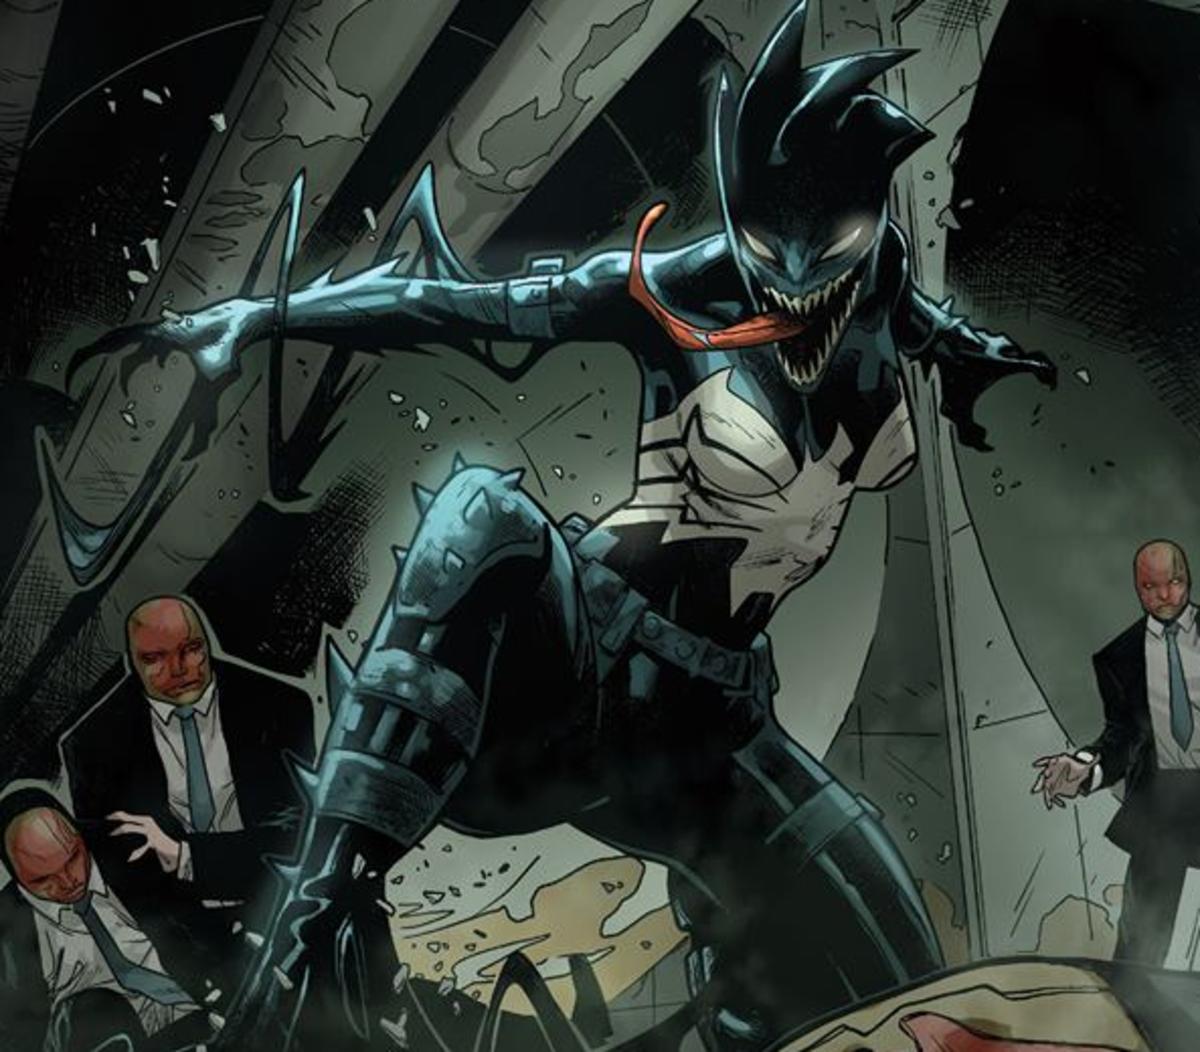 The Mania Symbiote